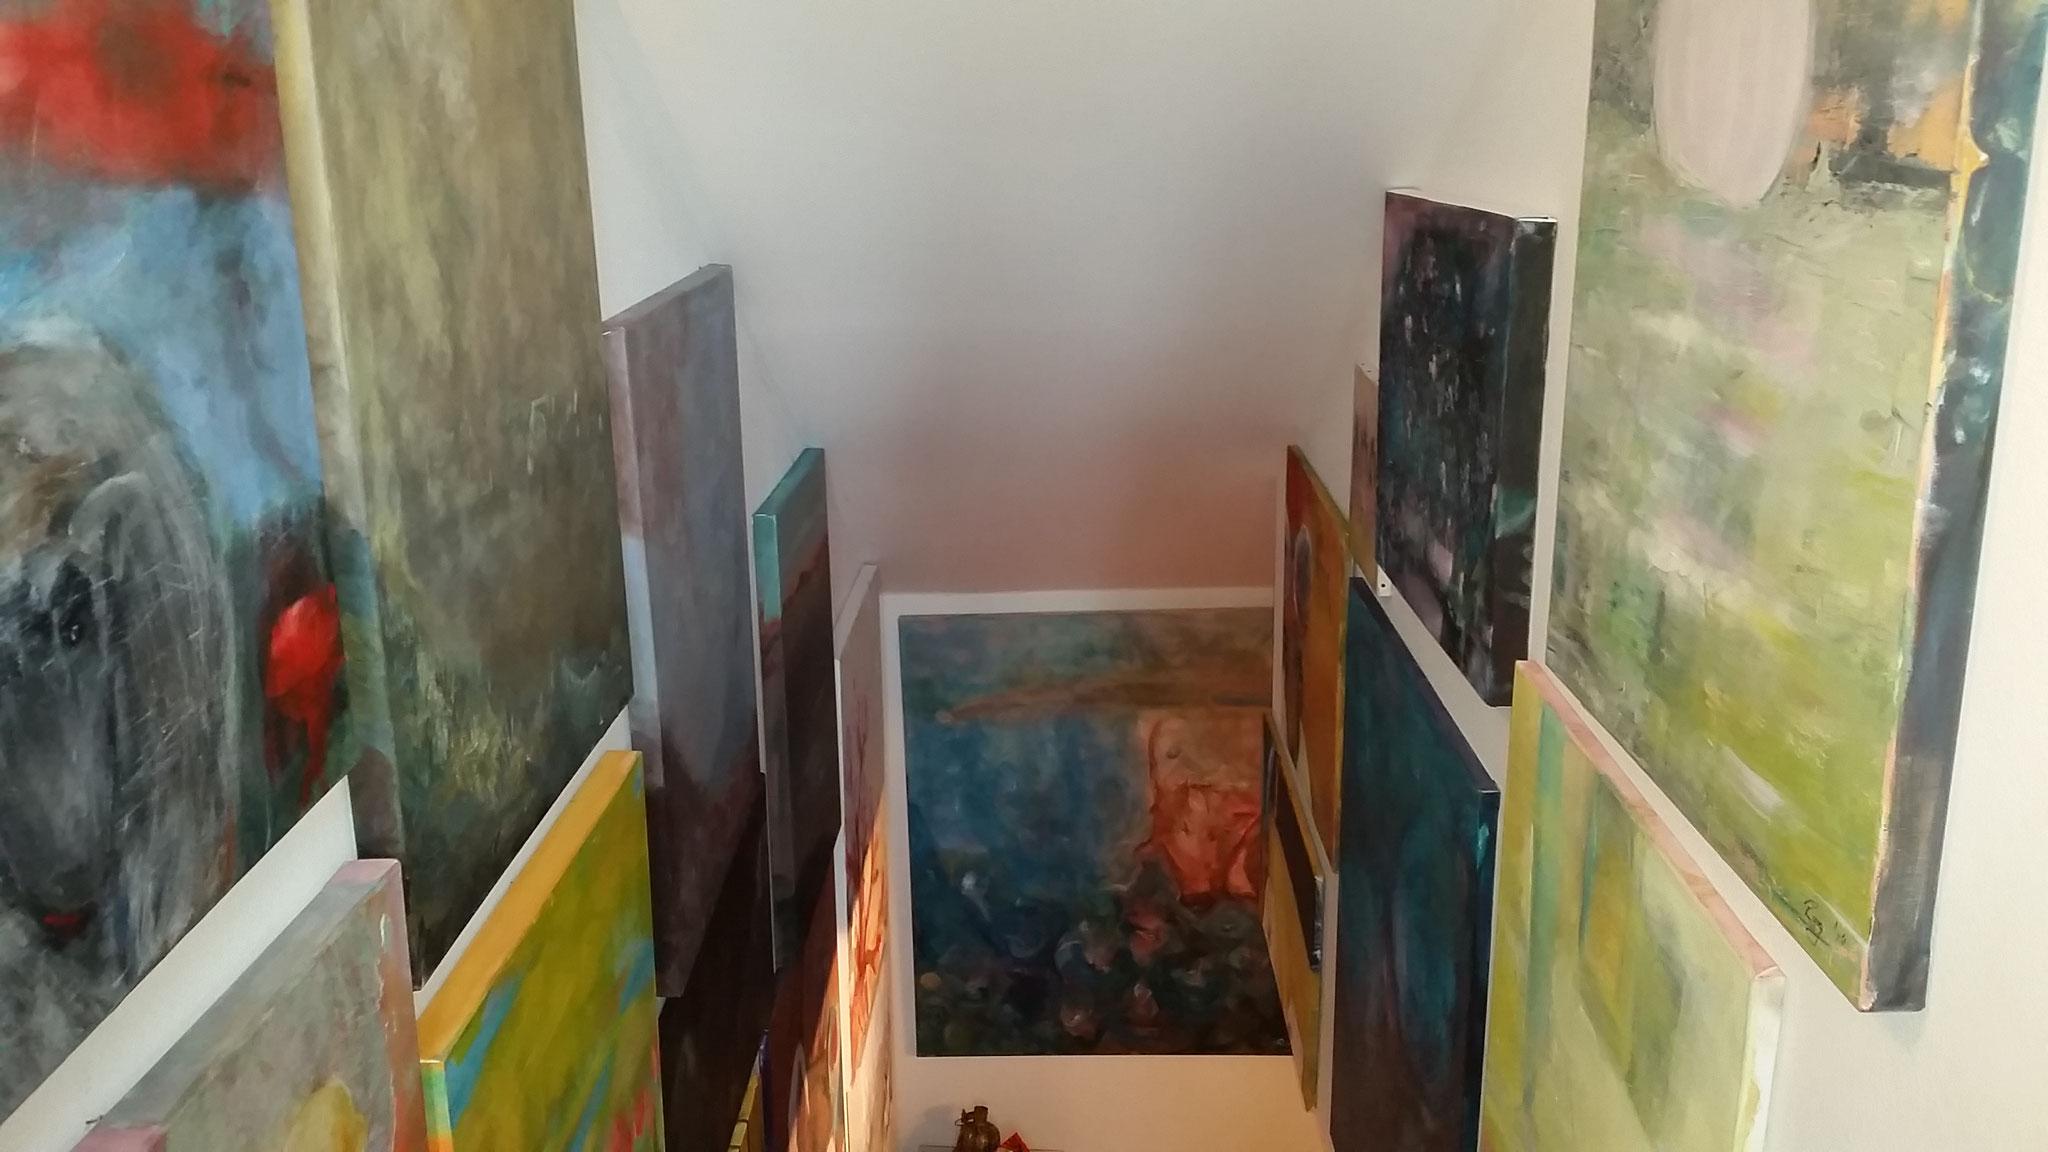 Treppen-Galerie 8, Maler Künstlerin Bozana